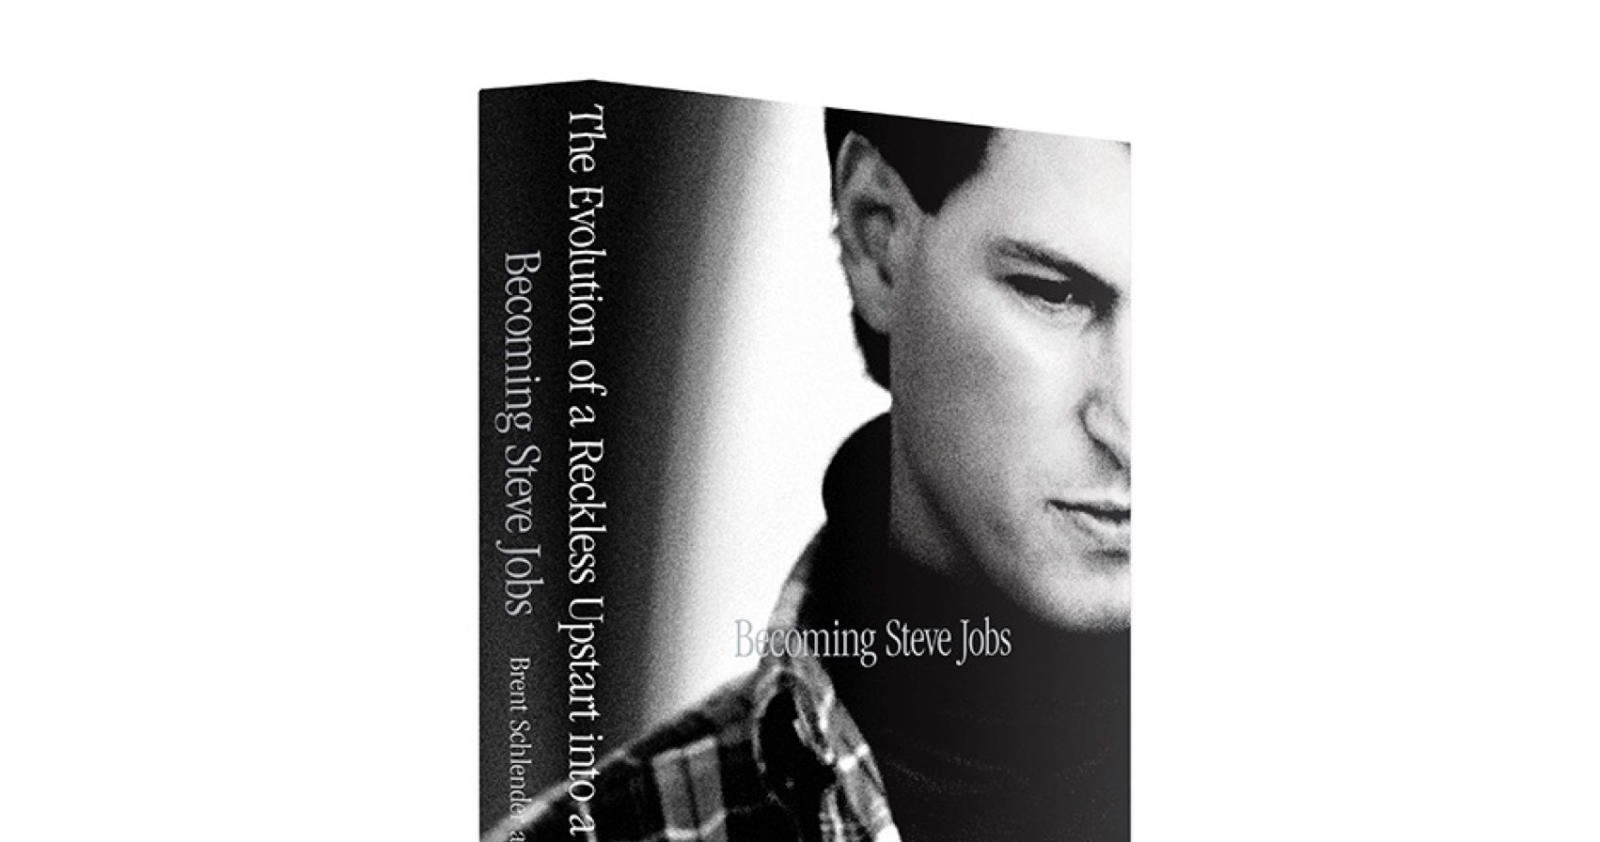 aff Apple buch ibooks Steve Jobs